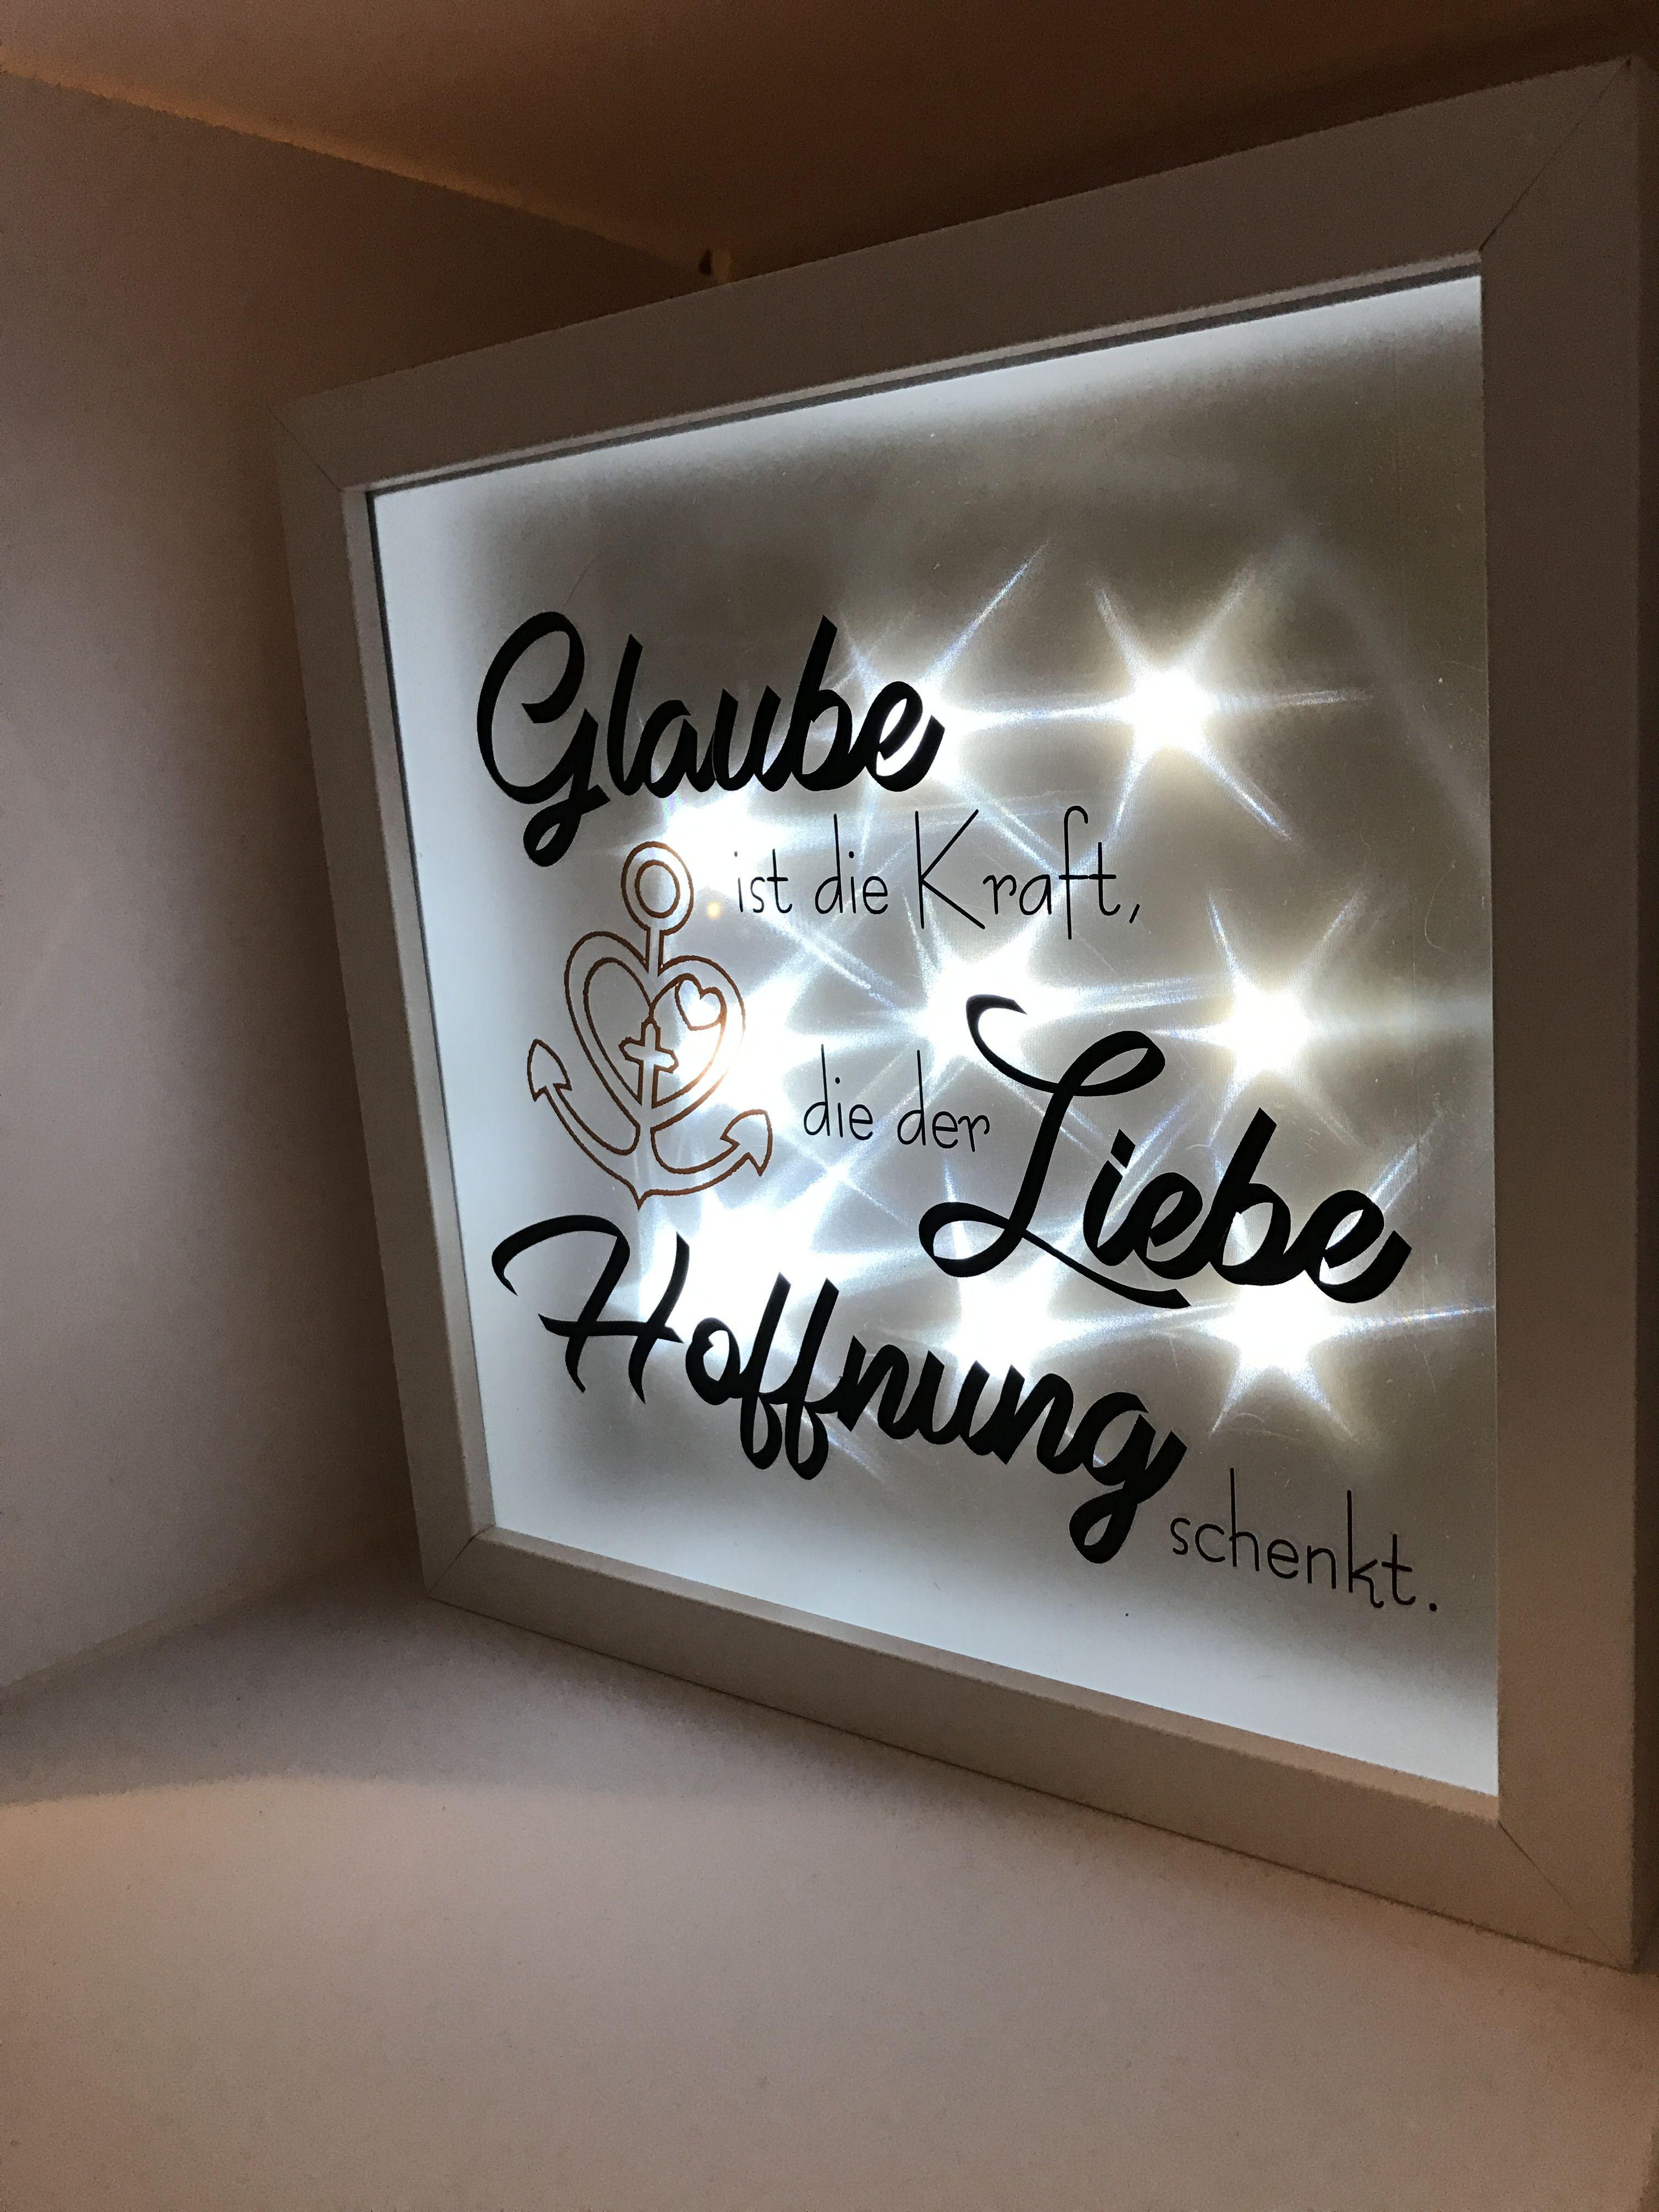 ribba beleuchteter bilderrahmen led lichterkette deko silhouette cameo beleuchteter. Black Bedroom Furniture Sets. Home Design Ideas